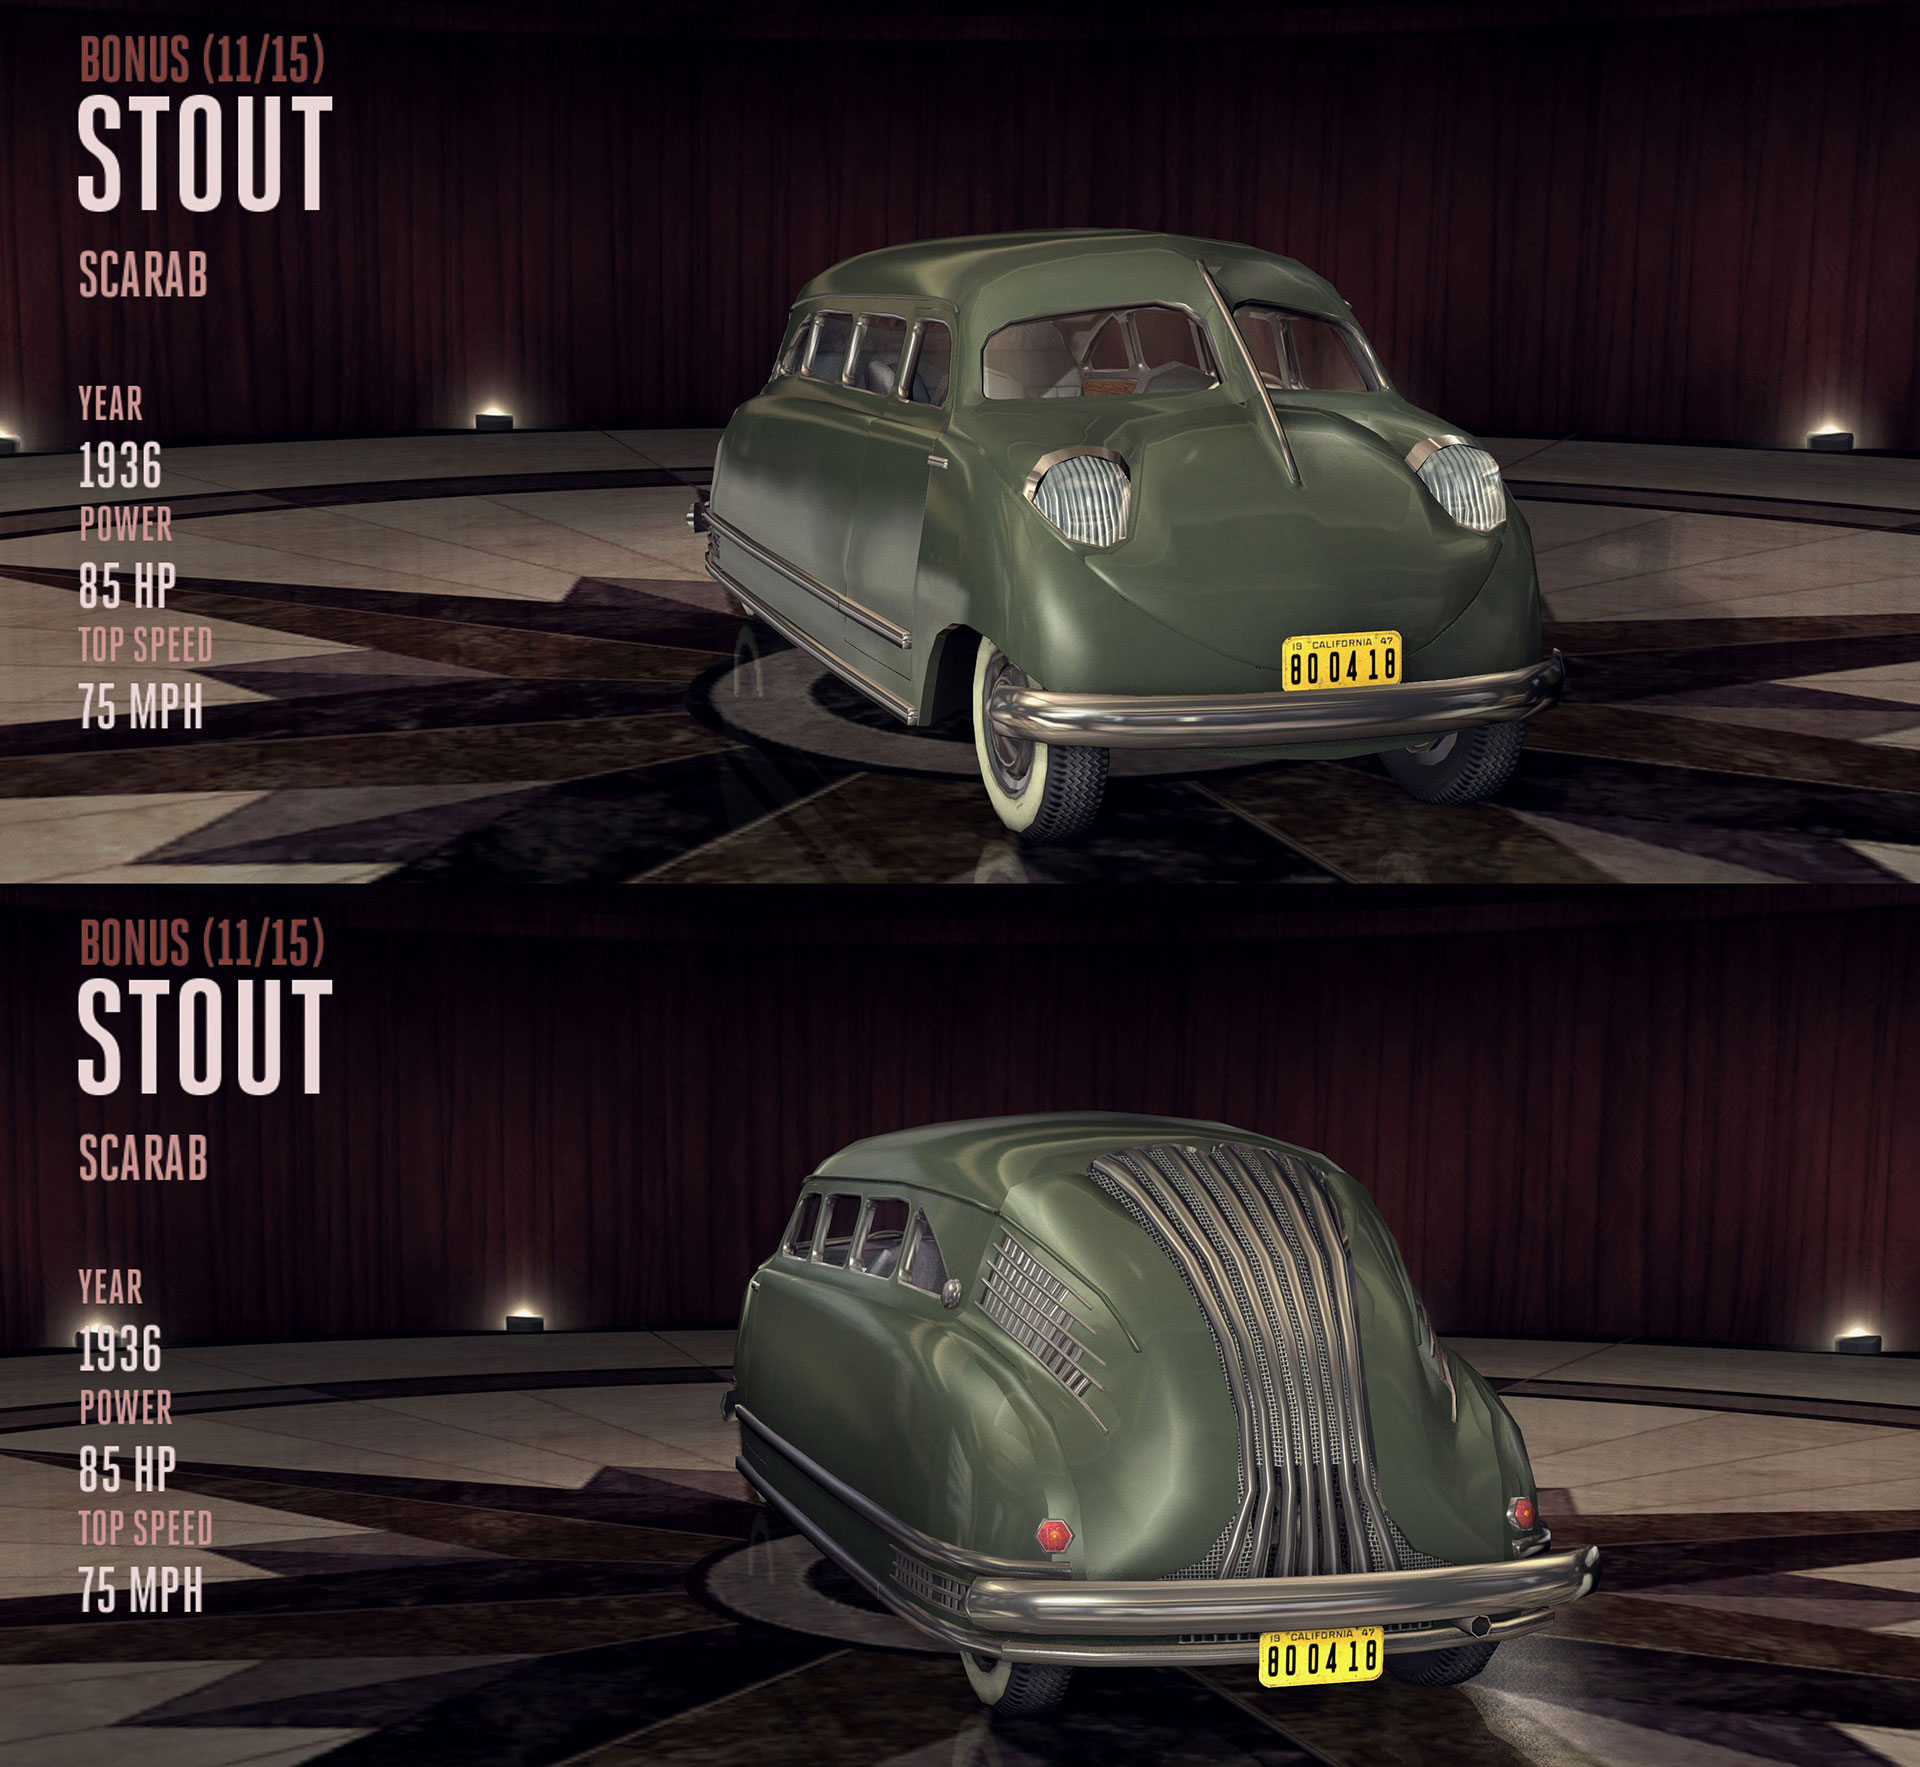 Archivo:1936-stout-scarab.jpg